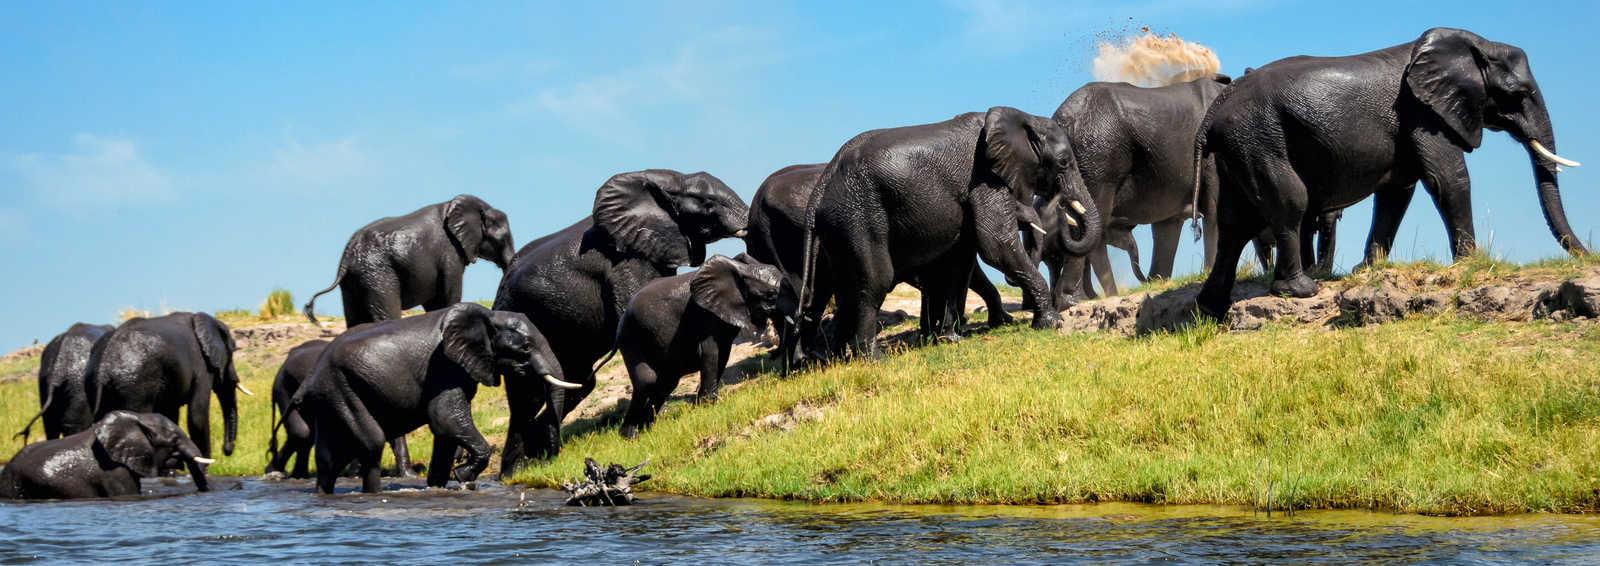 Elephants on a riverbank Chobe, N.P., Botswana